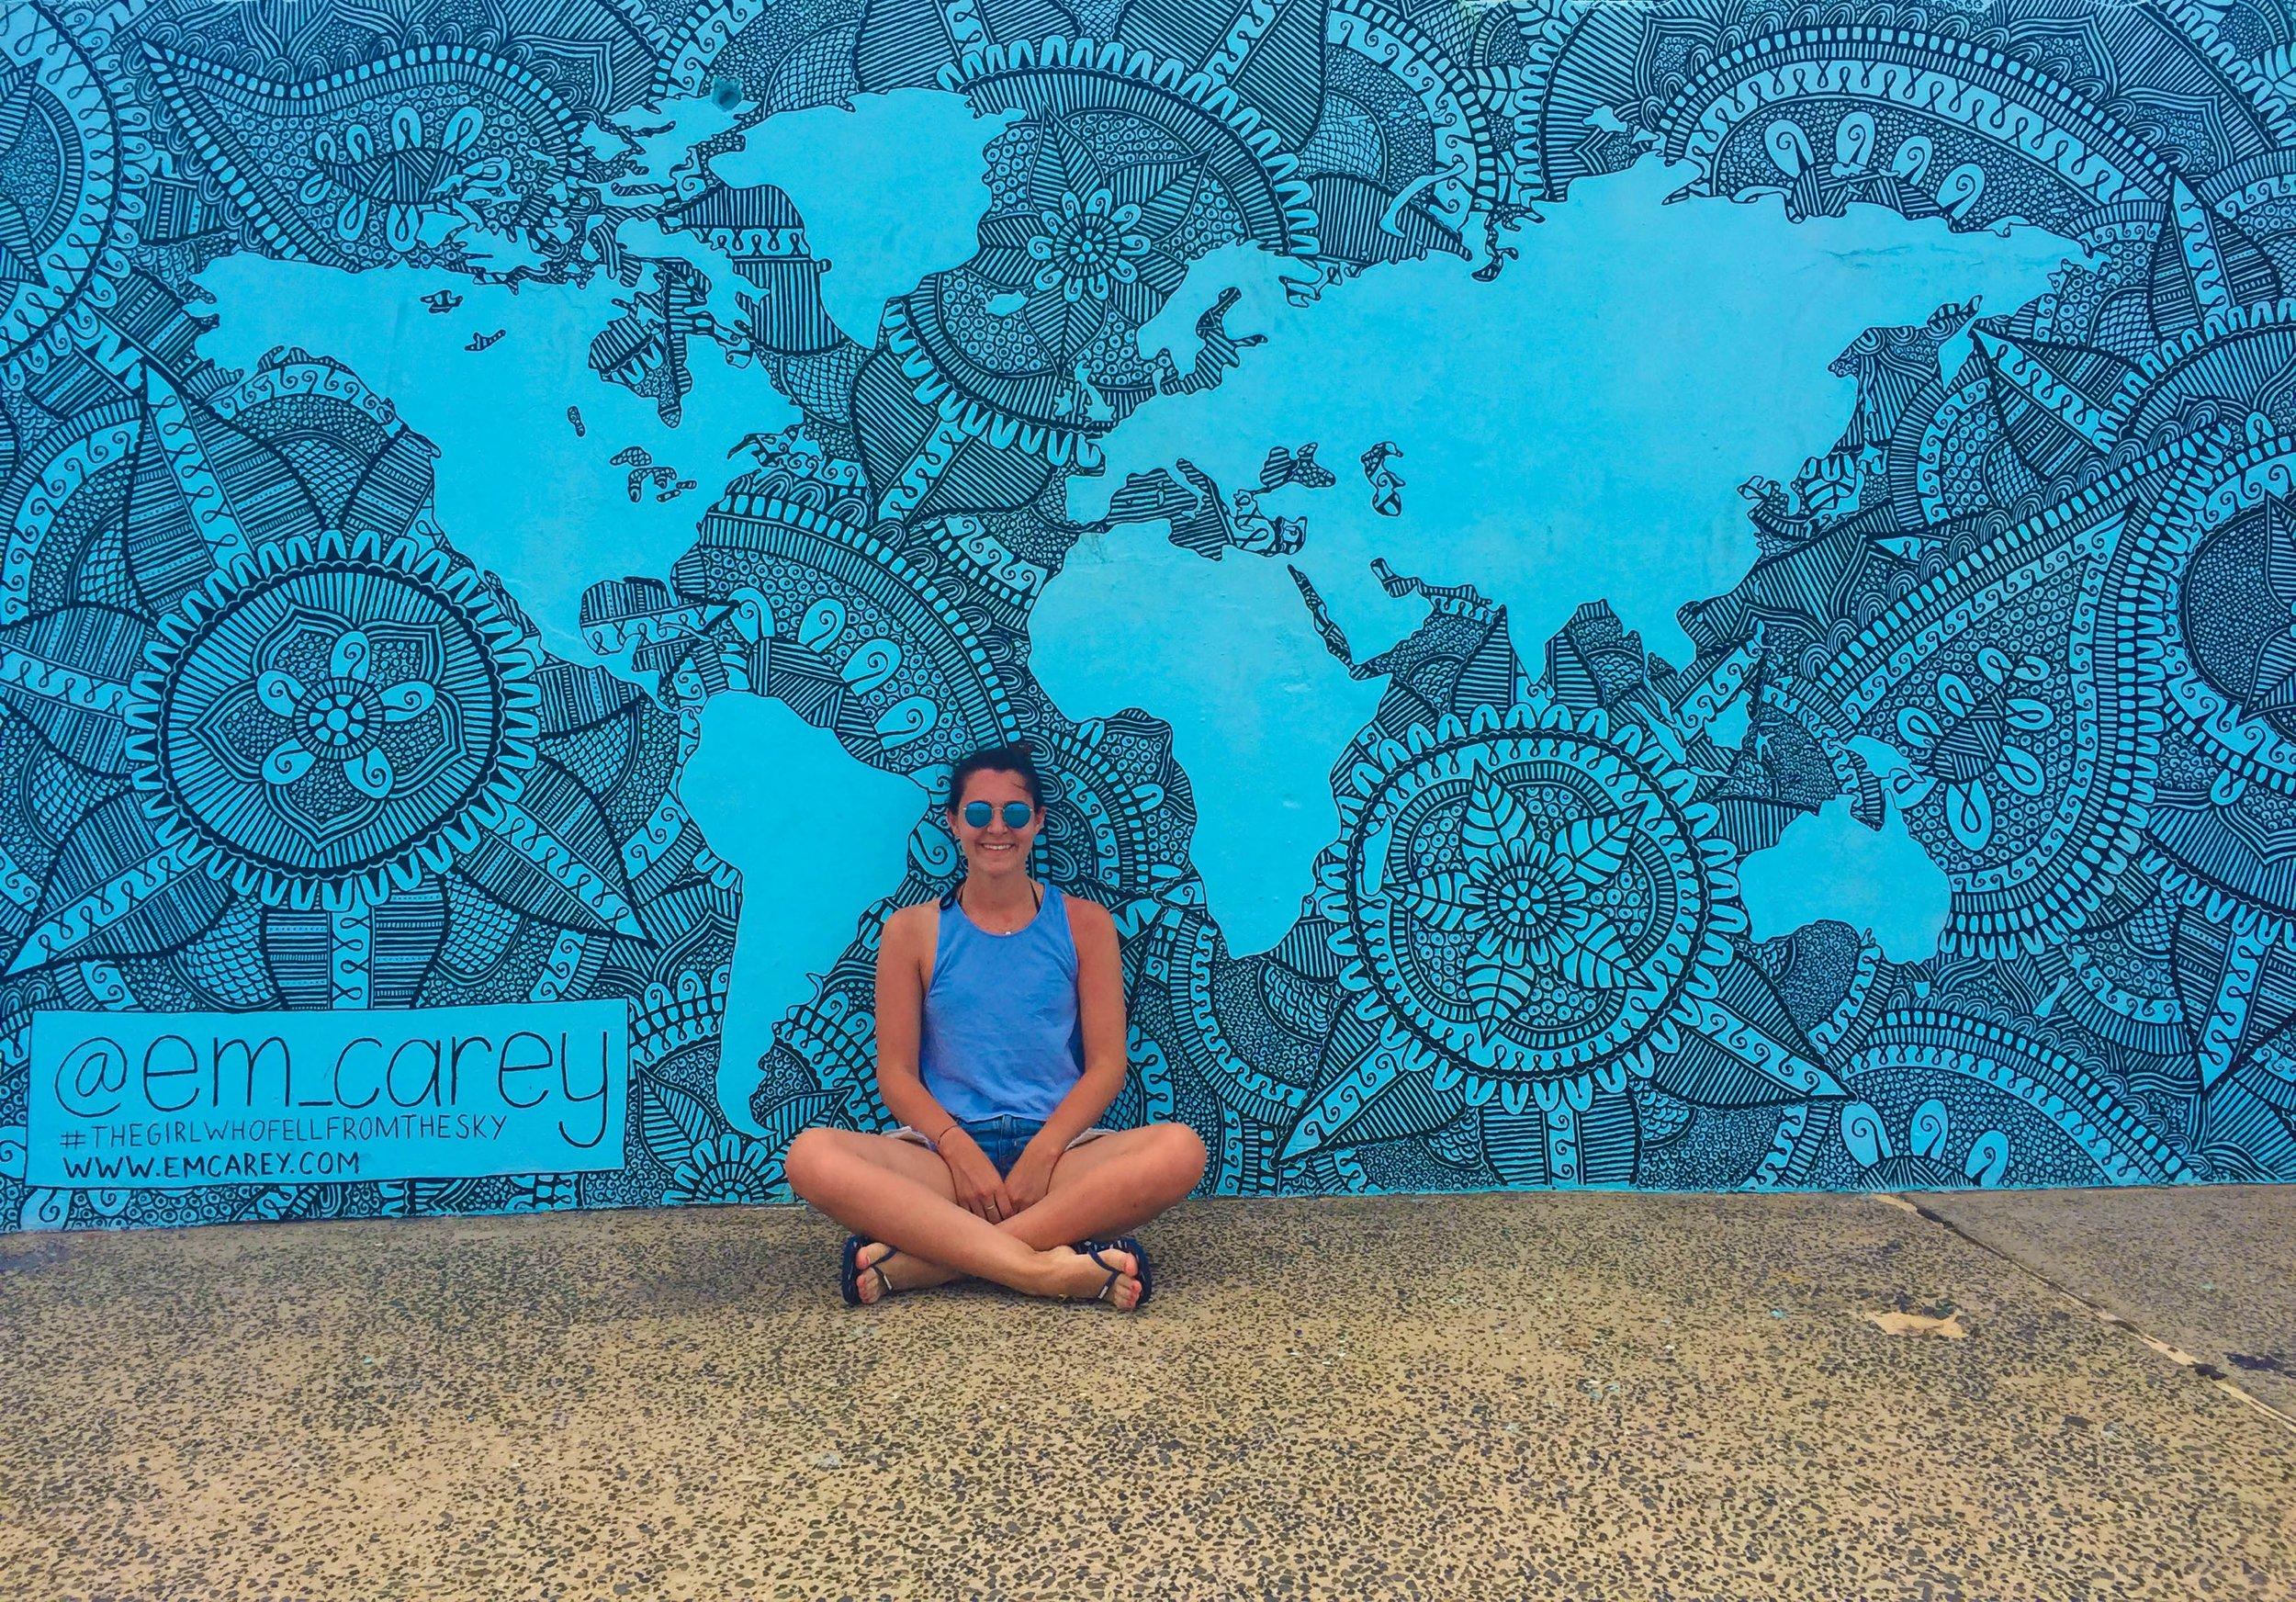 Mural at Bondi Beach by Emma Carey. Follow her incredible story on Instagram @em_carey.